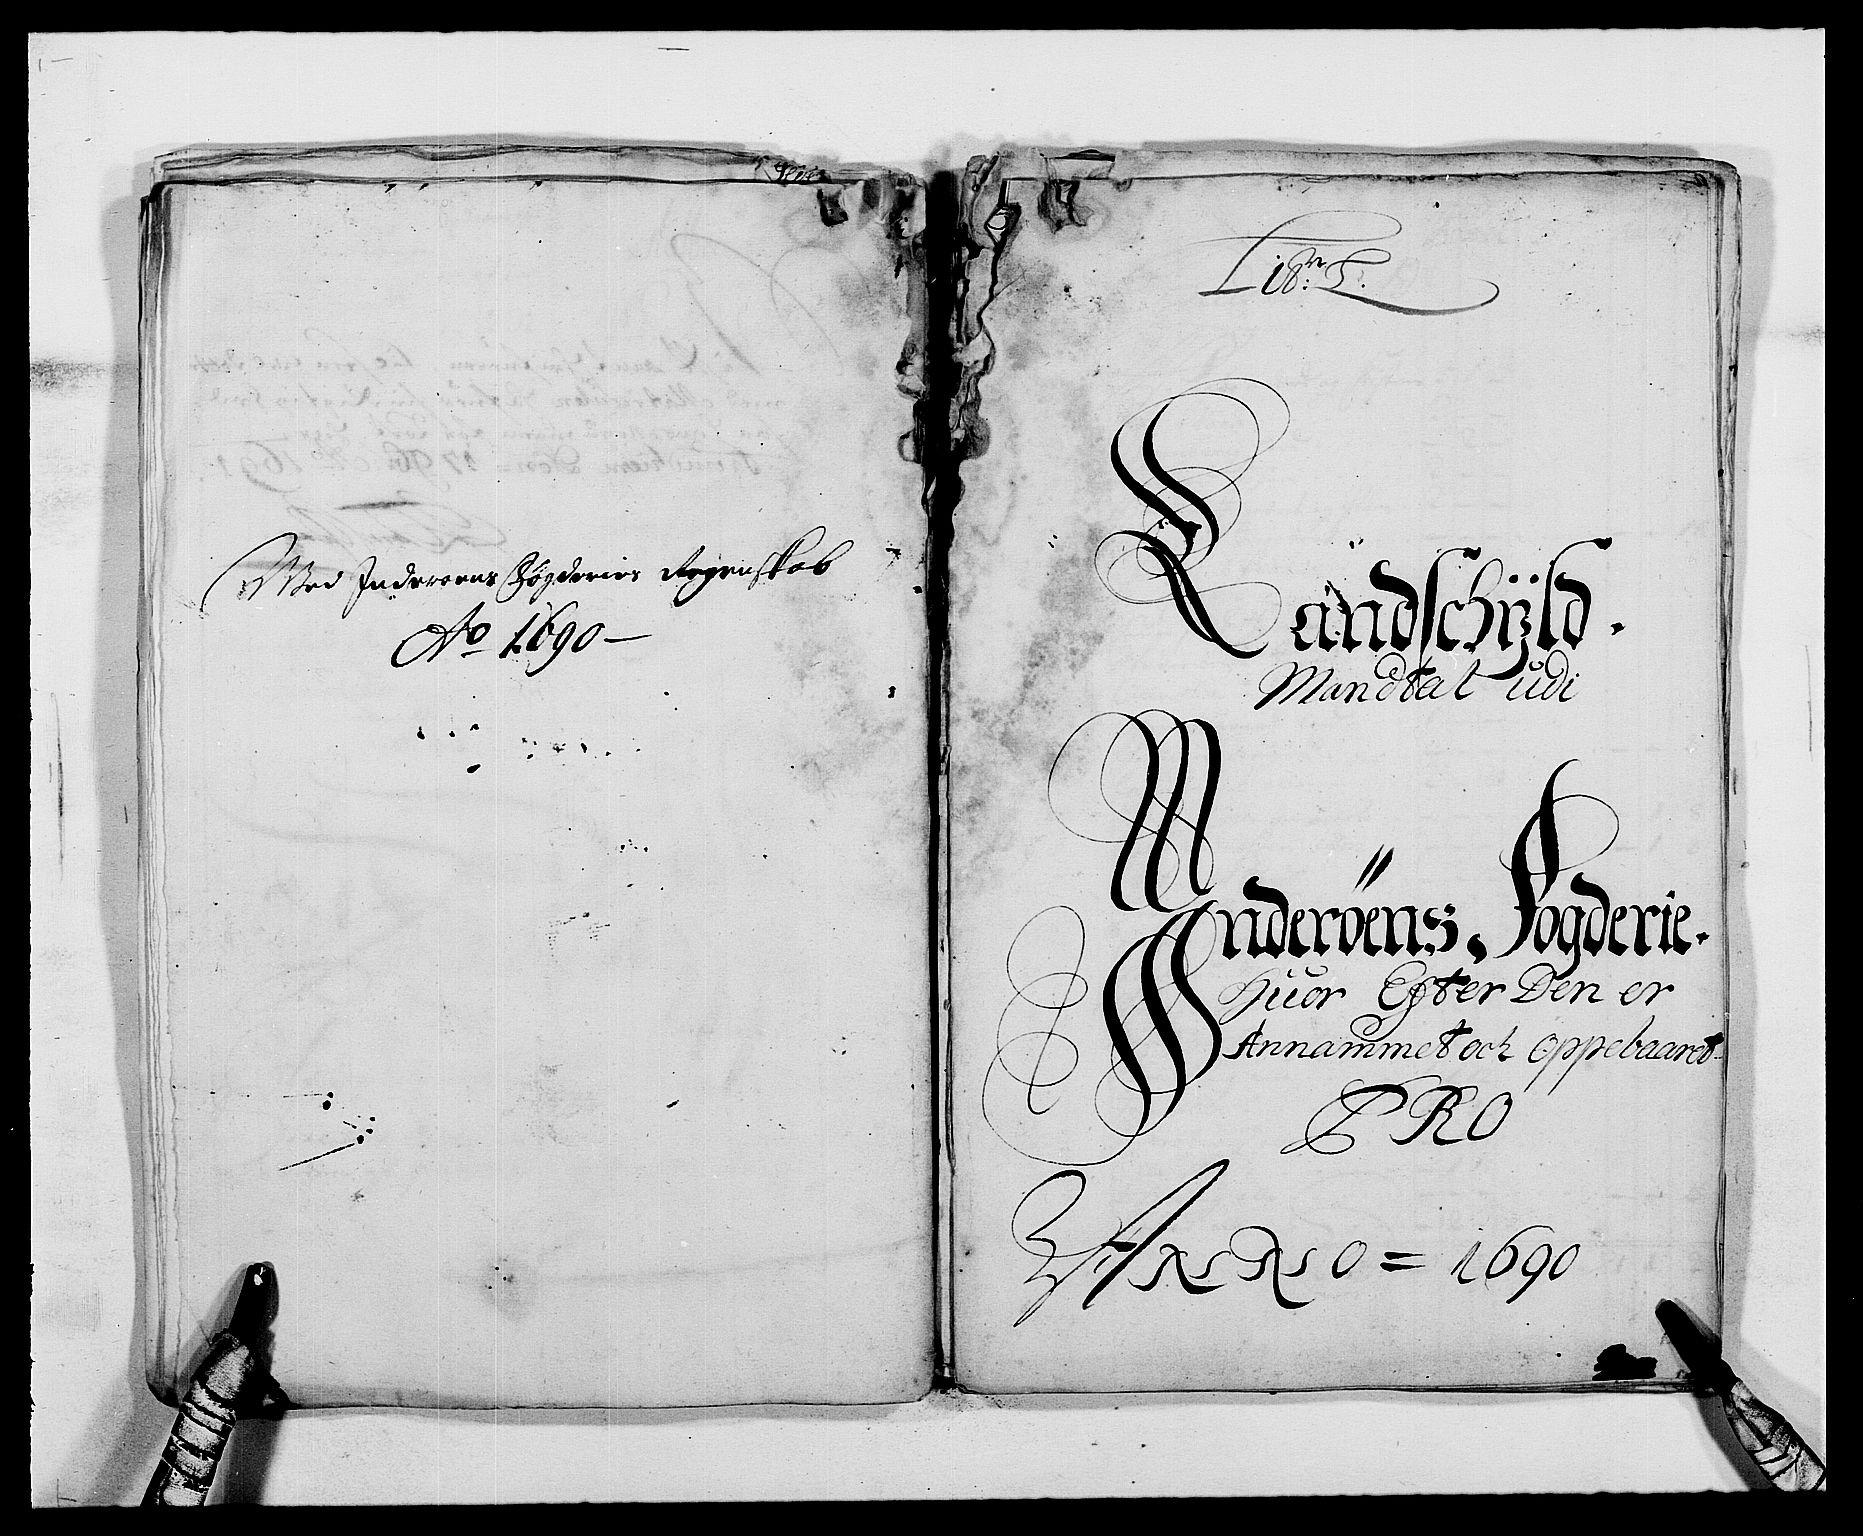 RA, Rentekammeret inntil 1814, Reviderte regnskaper, Fogderegnskap, R63/L4307: Fogderegnskap Inderøy, 1690-1691, s. 147